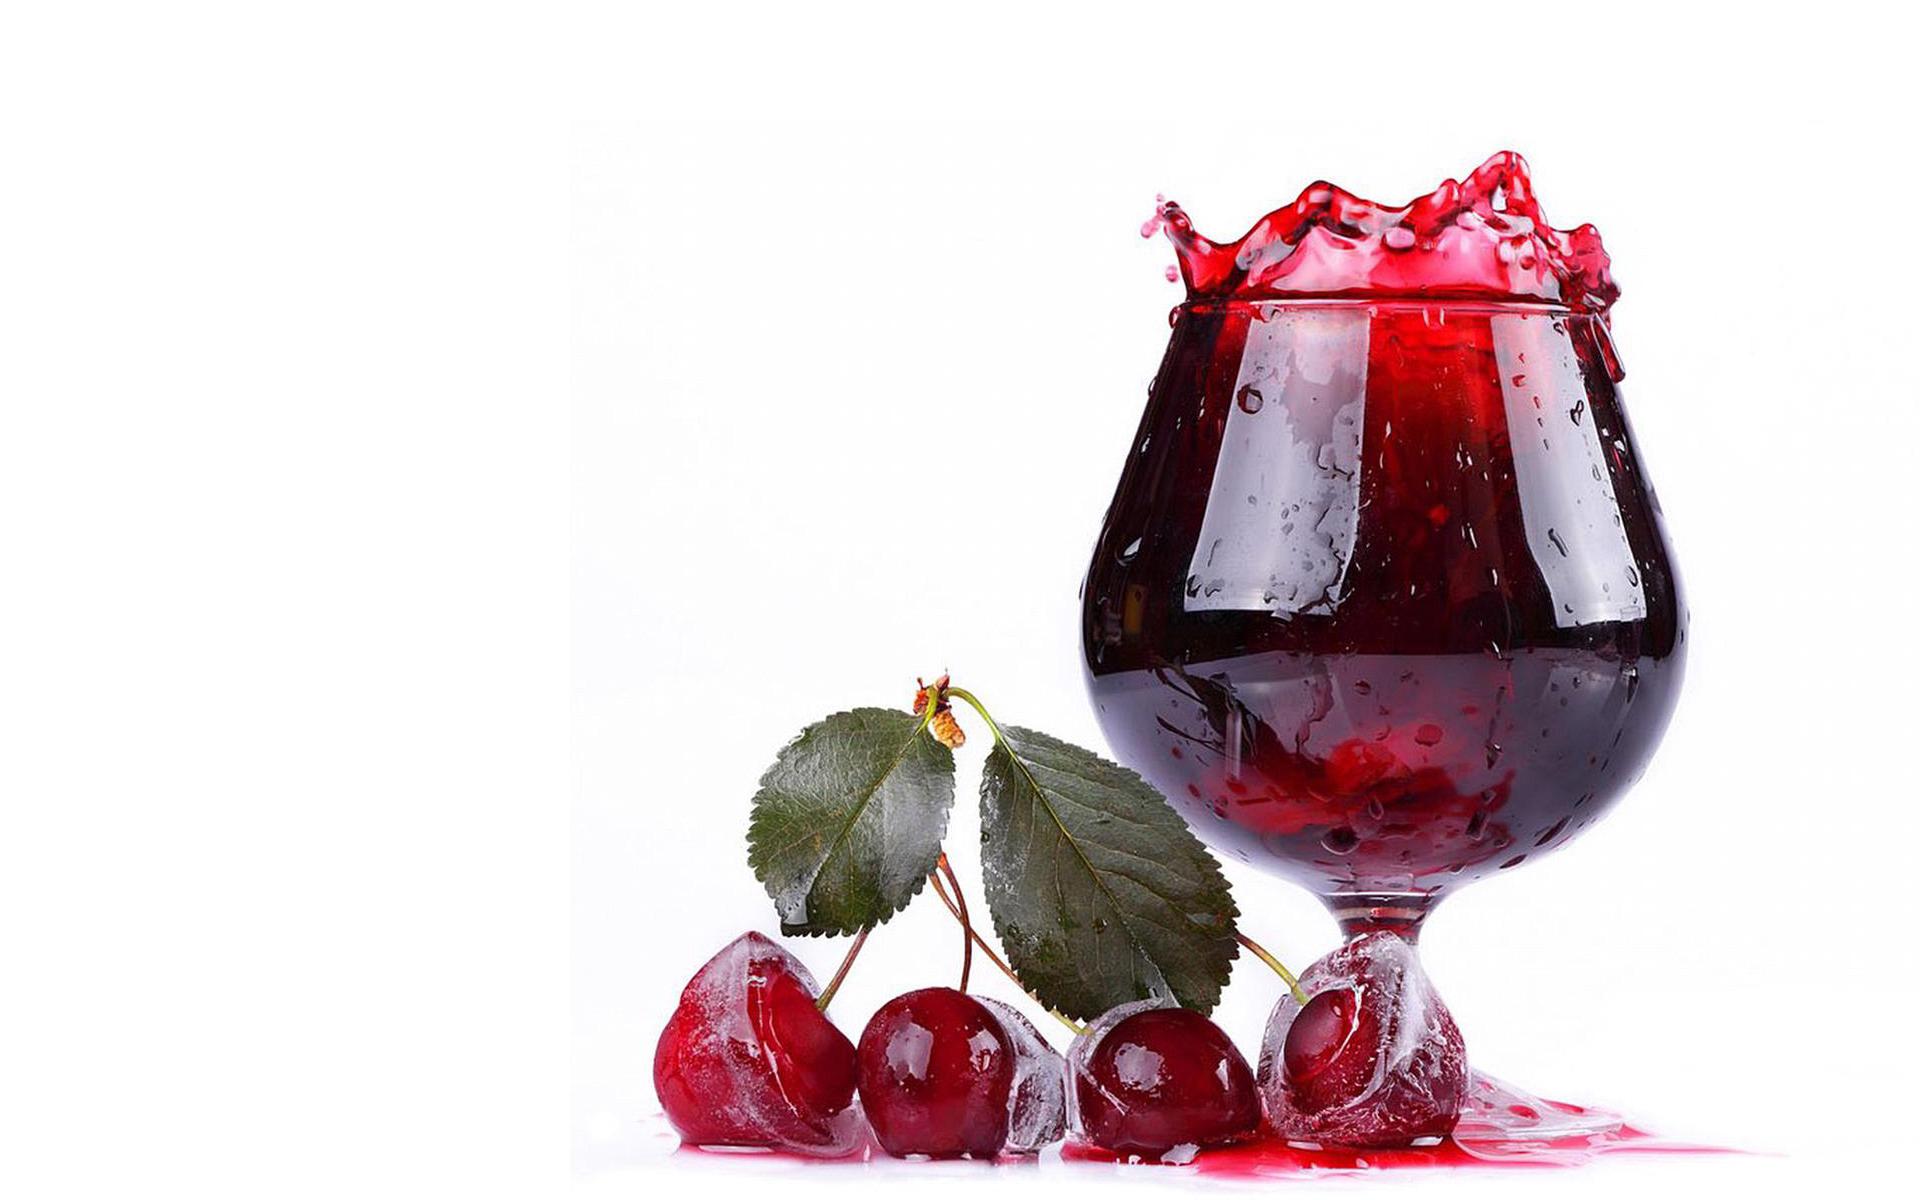 Wine HD Wallpaper Background Image 1920x1200 ID329416 1920x1200